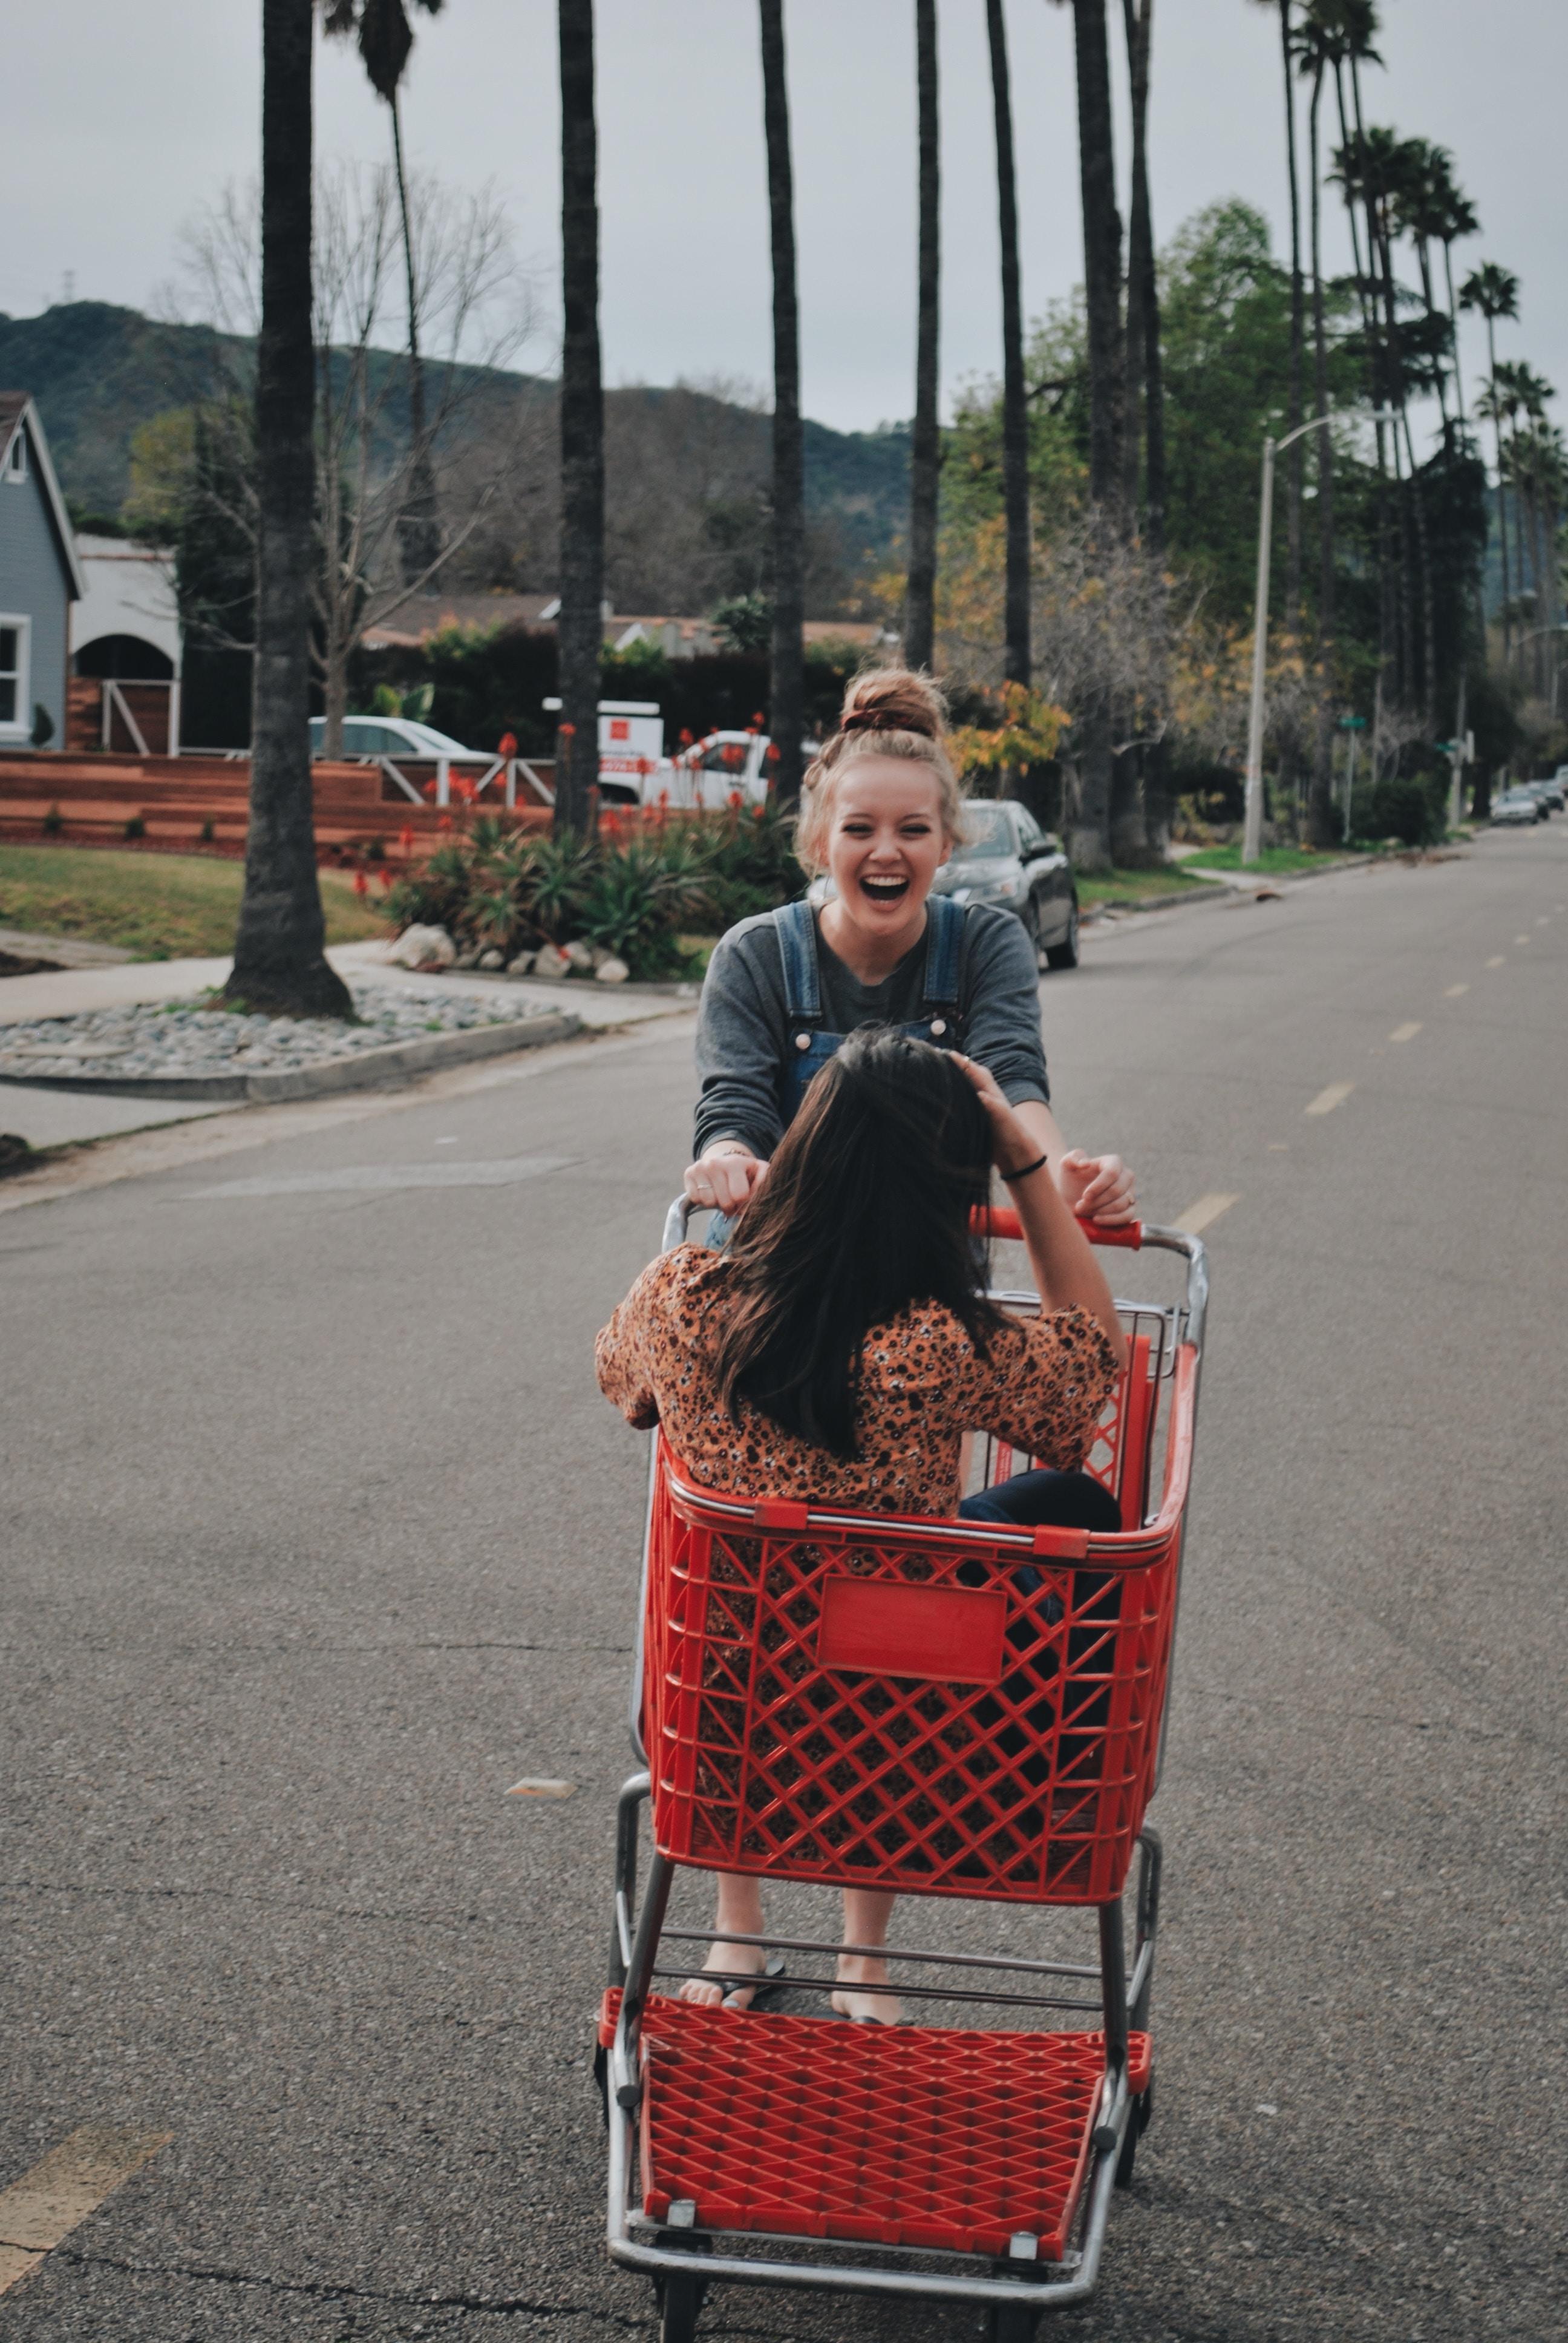 woman pushing shopping cart with woman riding in it